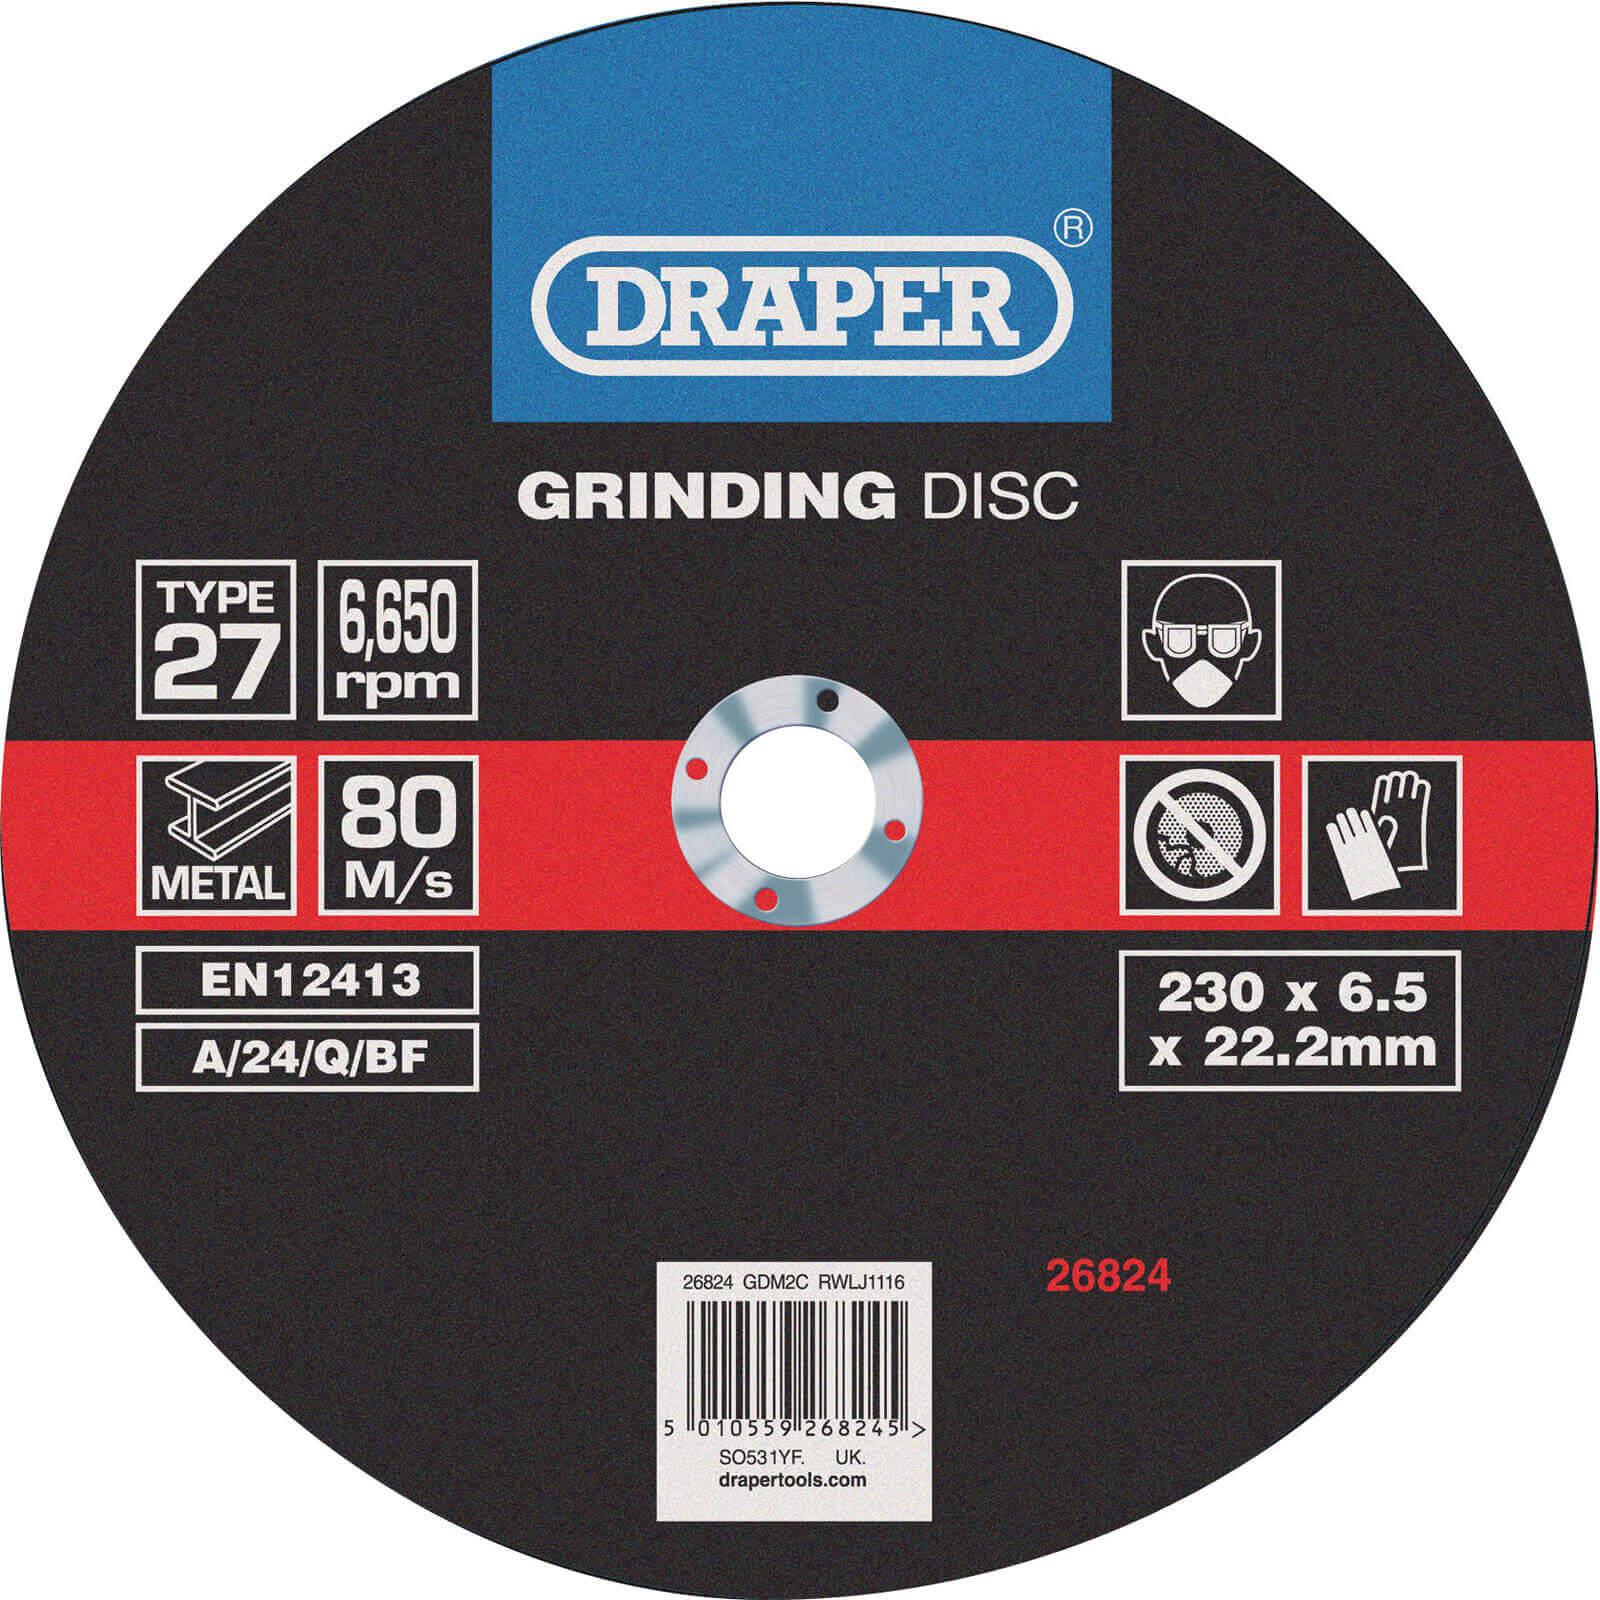 Image of Draper Depressed Centre Grinding Disc 230mm 6mm 22mm